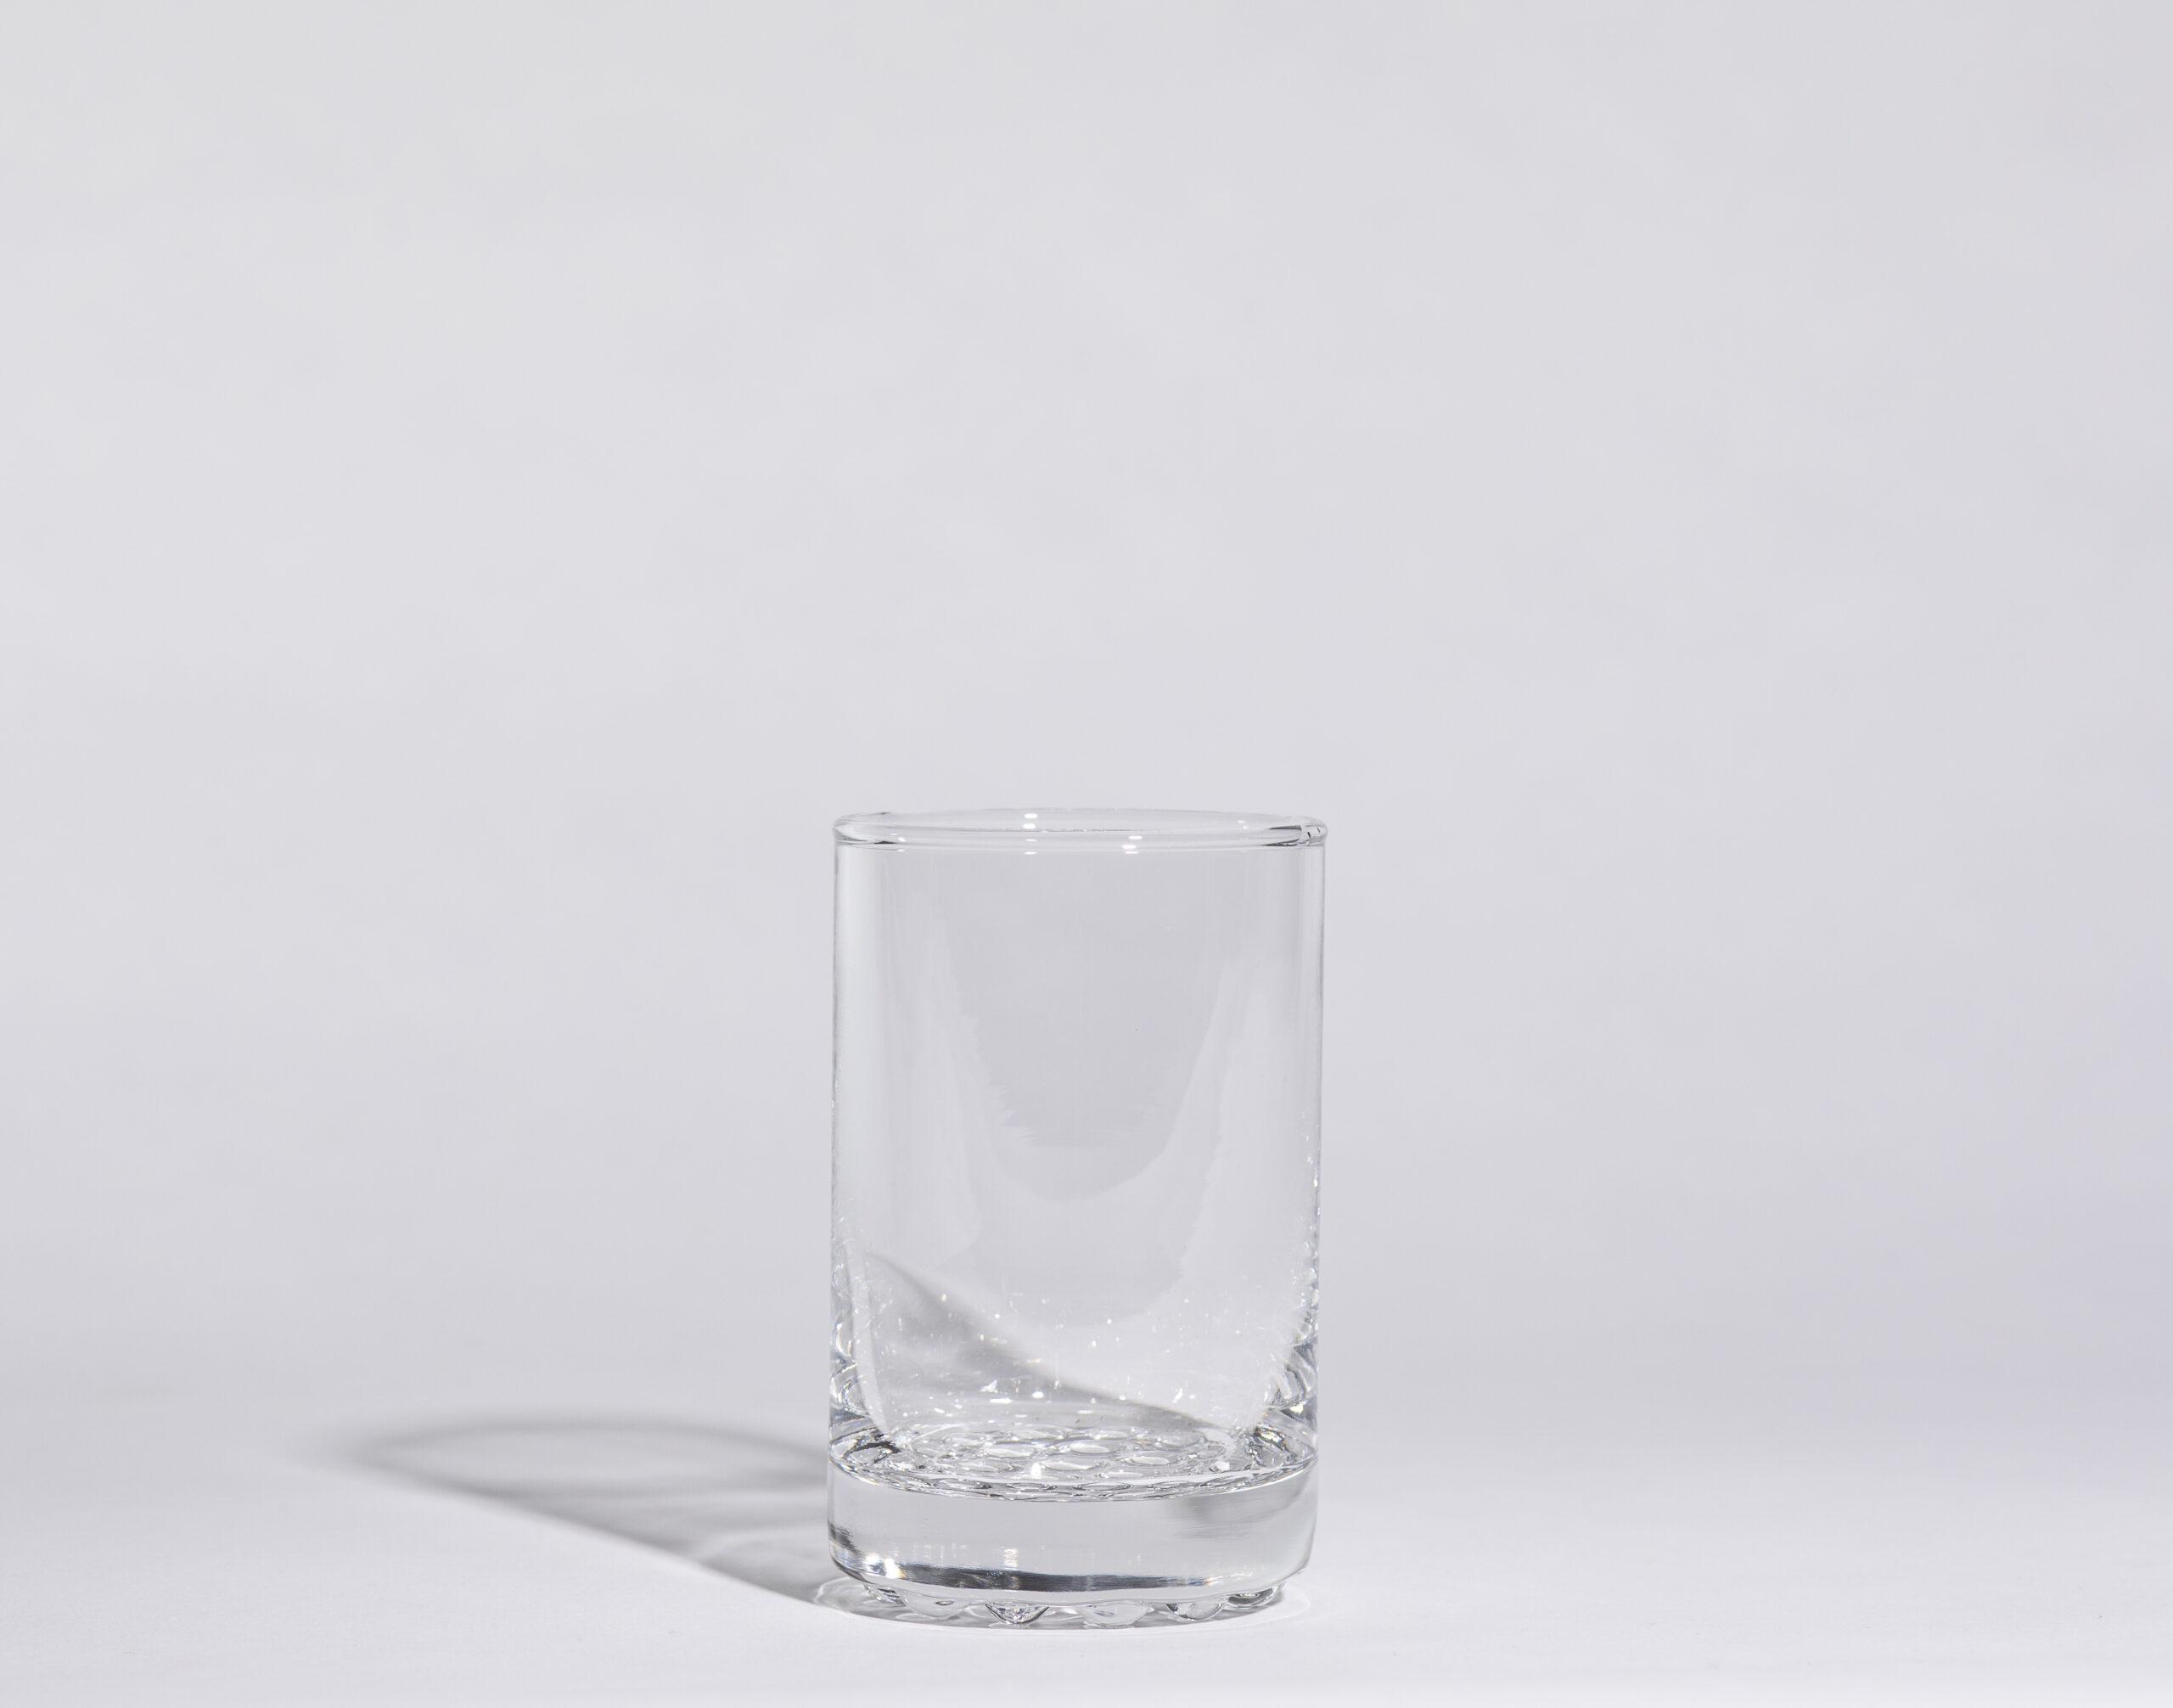 Juice glasses (5oz)